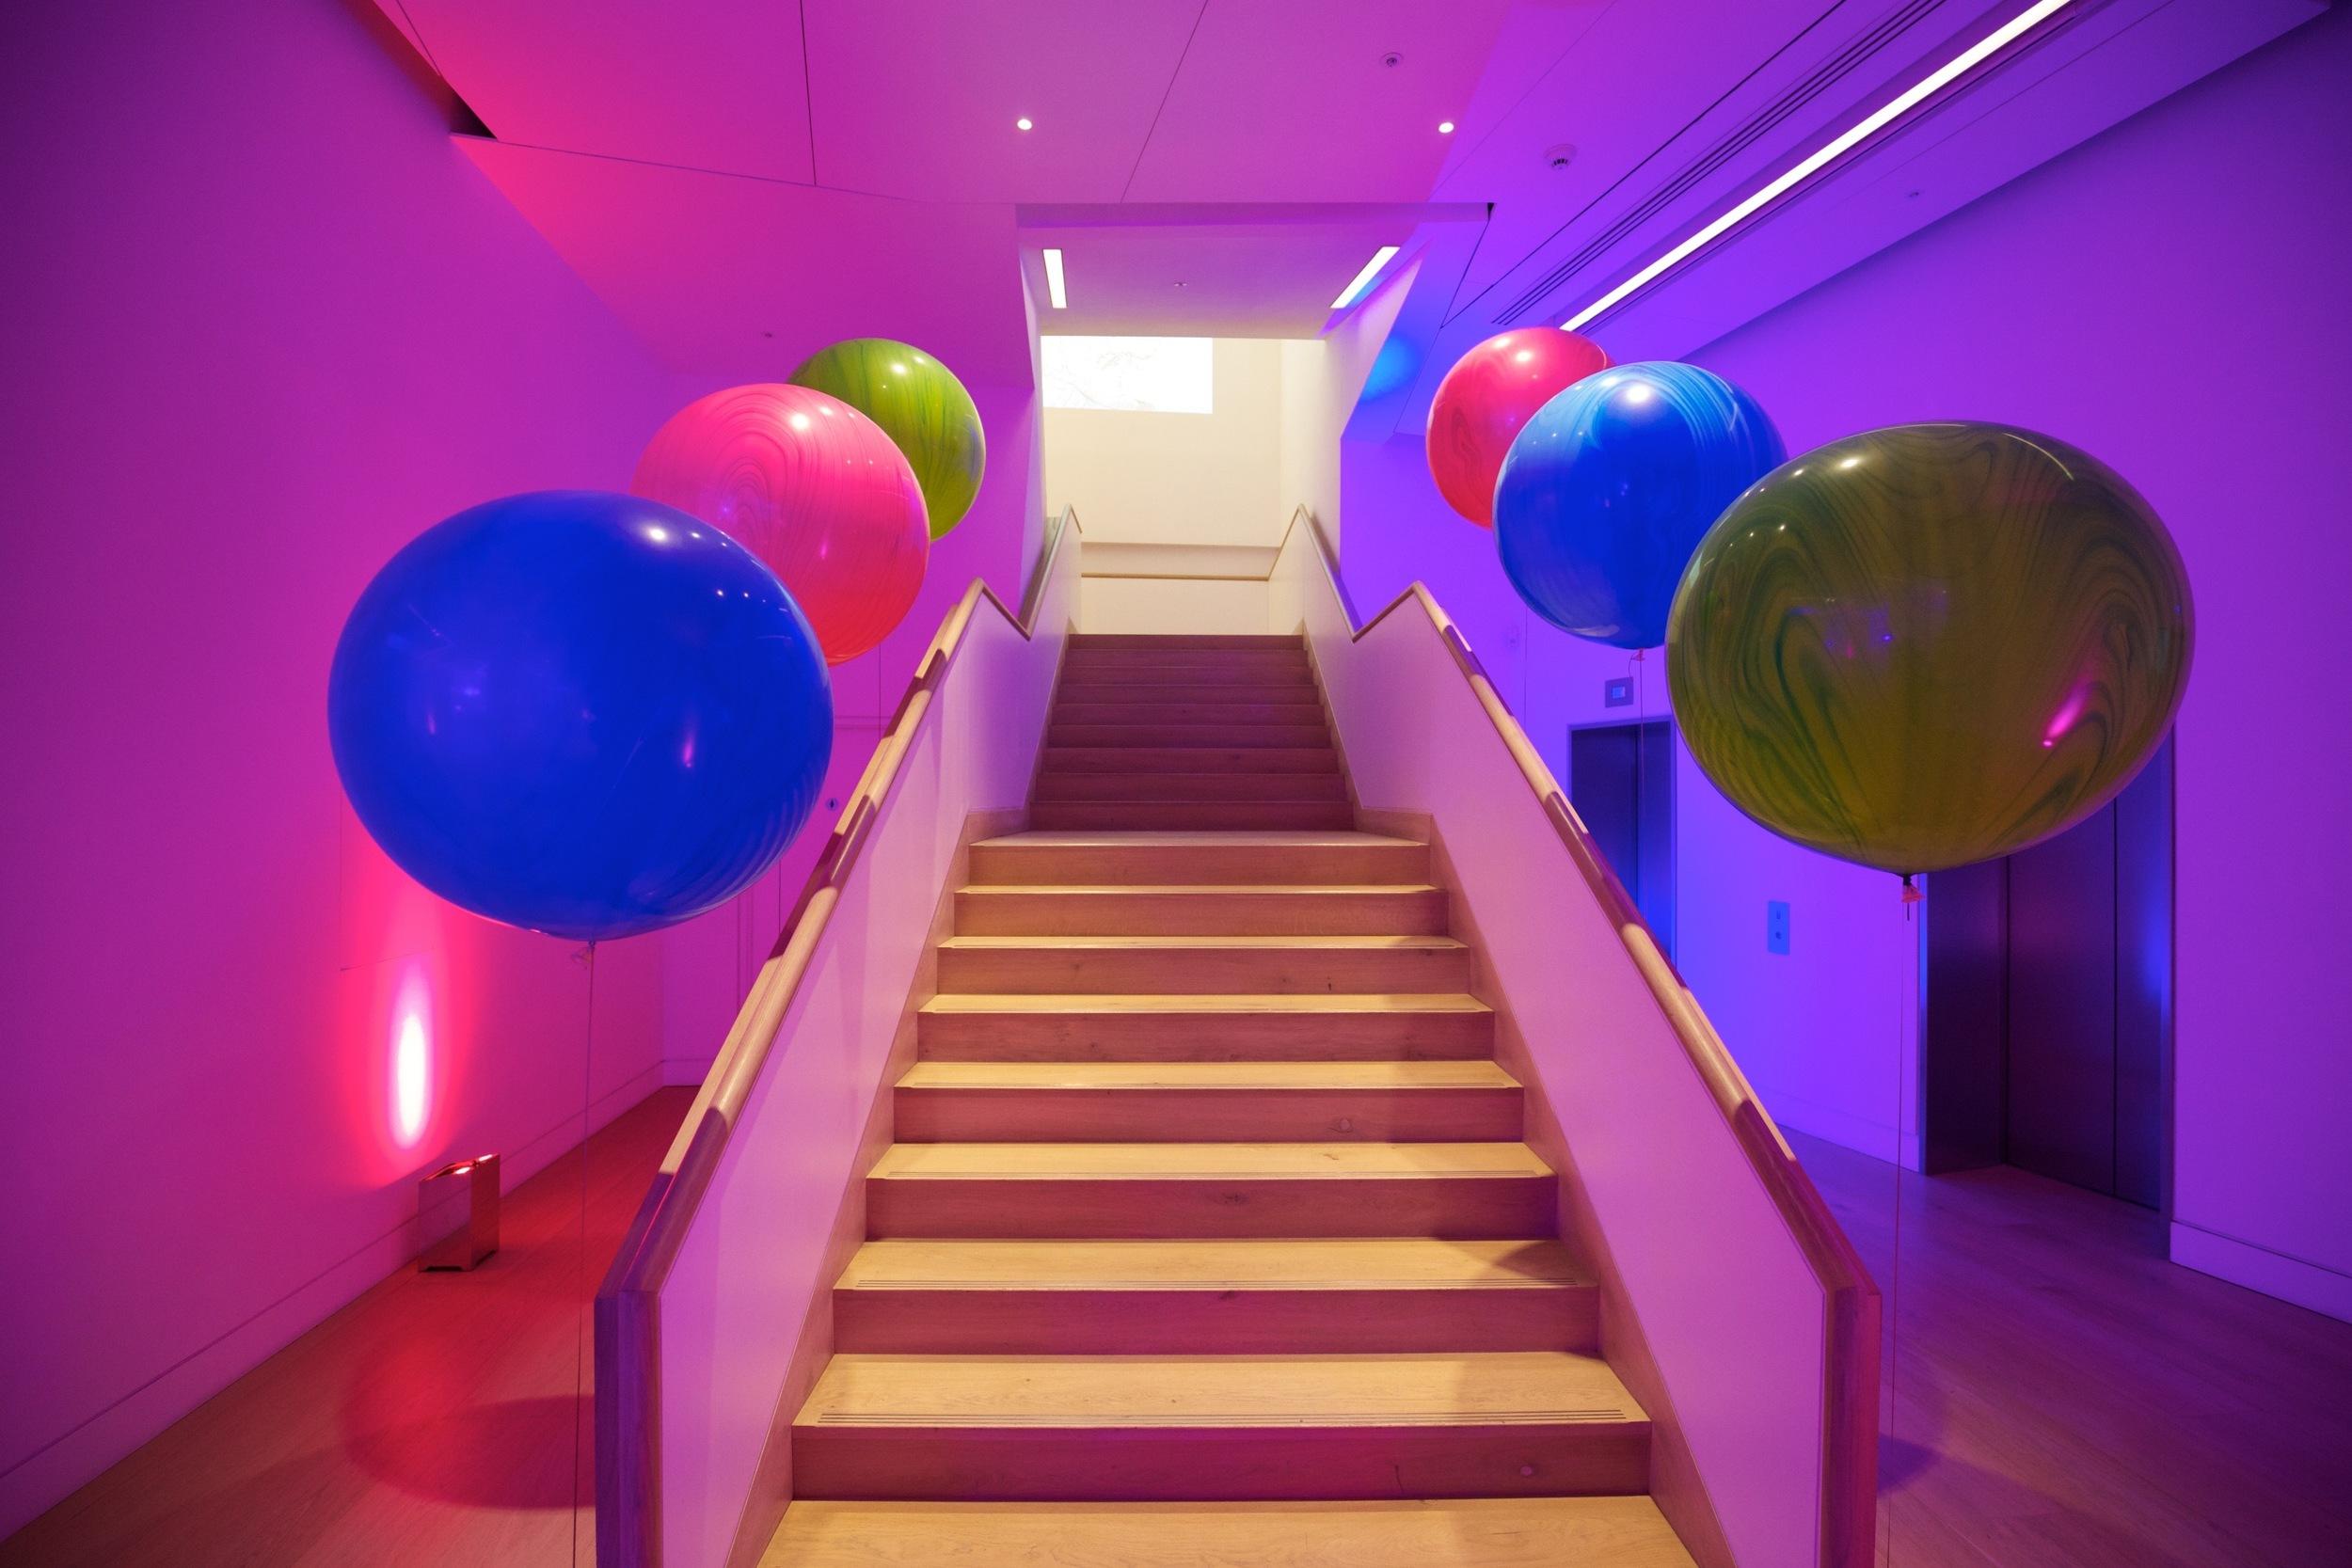 Creventive BarMitzvah Design Philips Gallery Event Production Entertainment